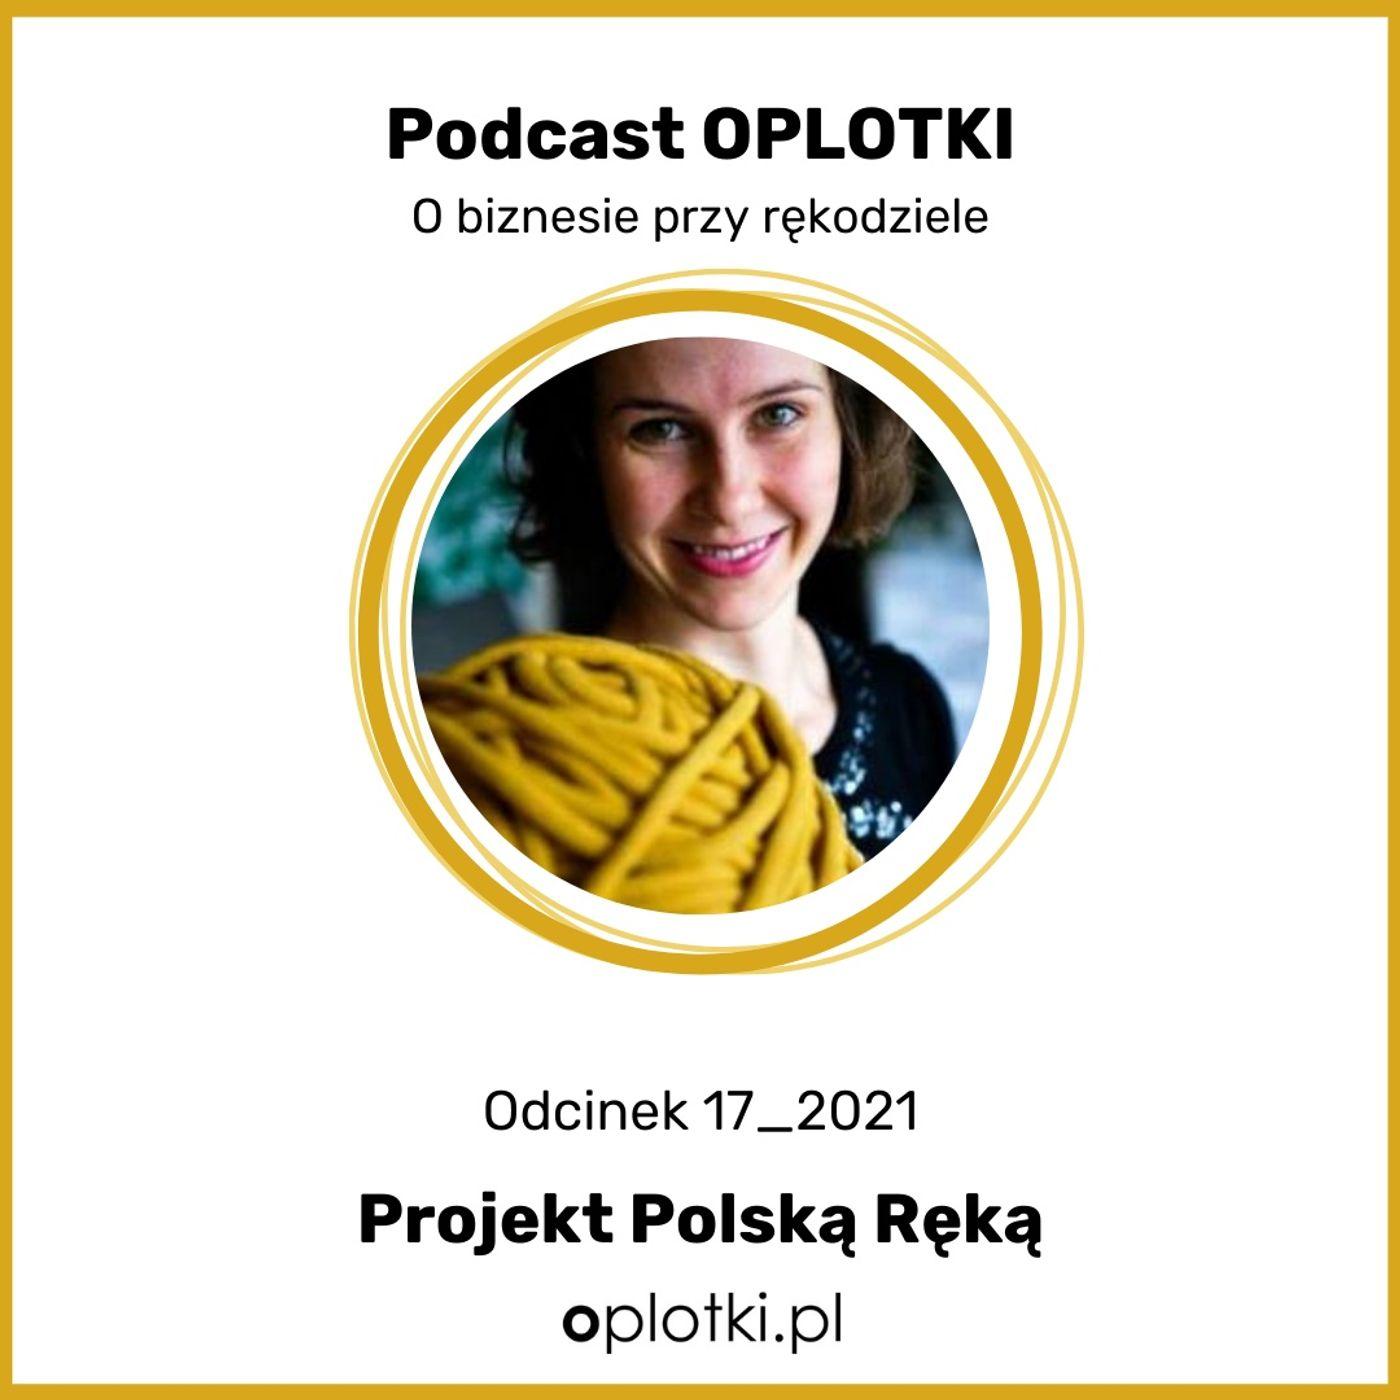 17_2021 Projekt Polską Ręką